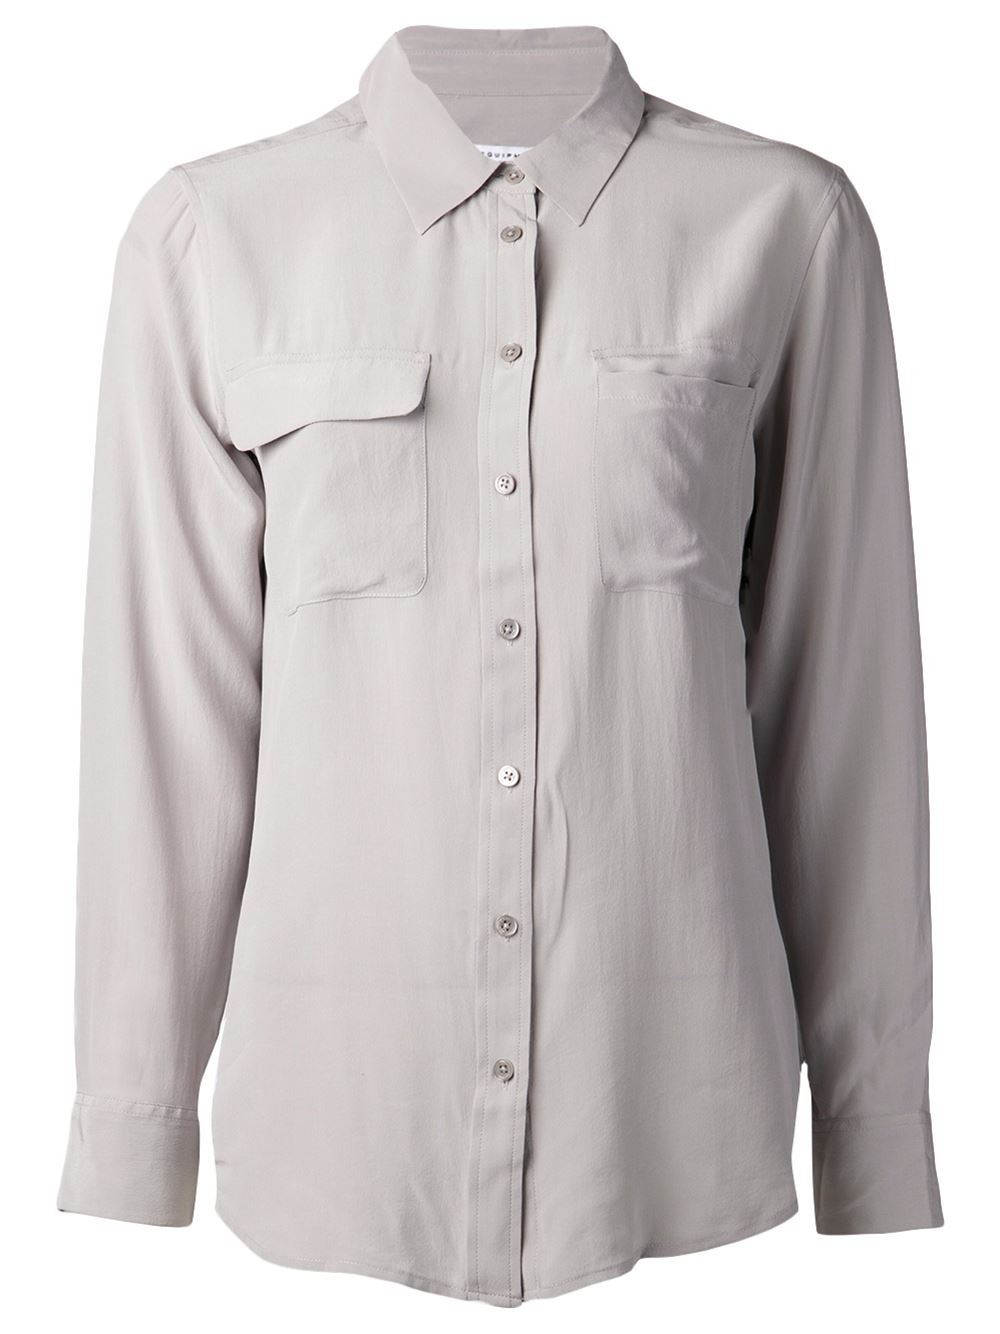 c7deb2c8348b62 Equipment Femme Silk Shirts